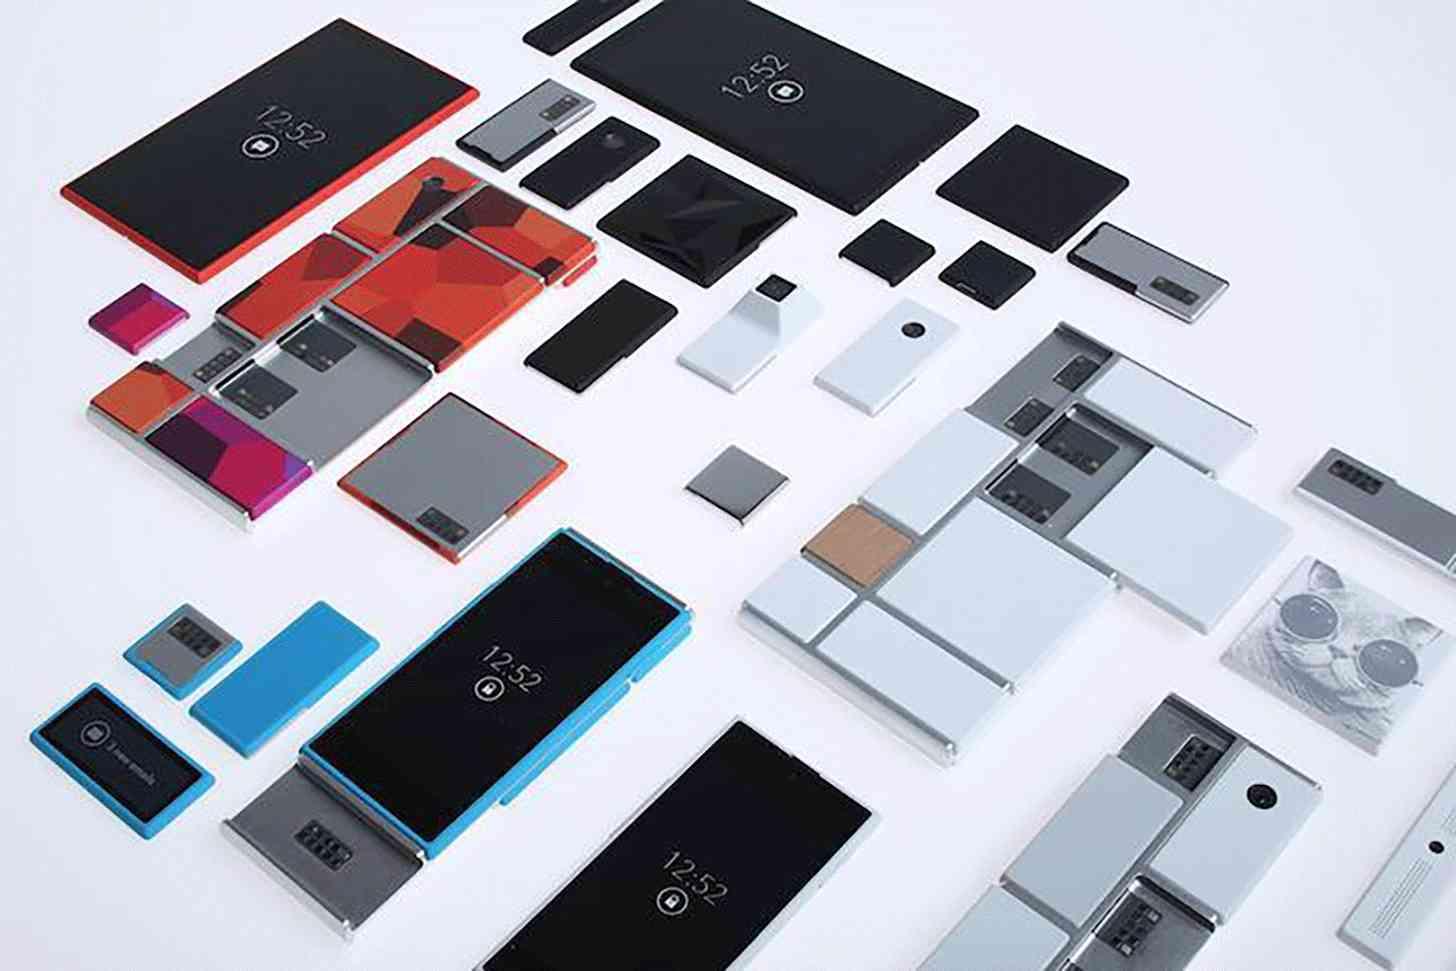 Project Ara modular smartphone announcement